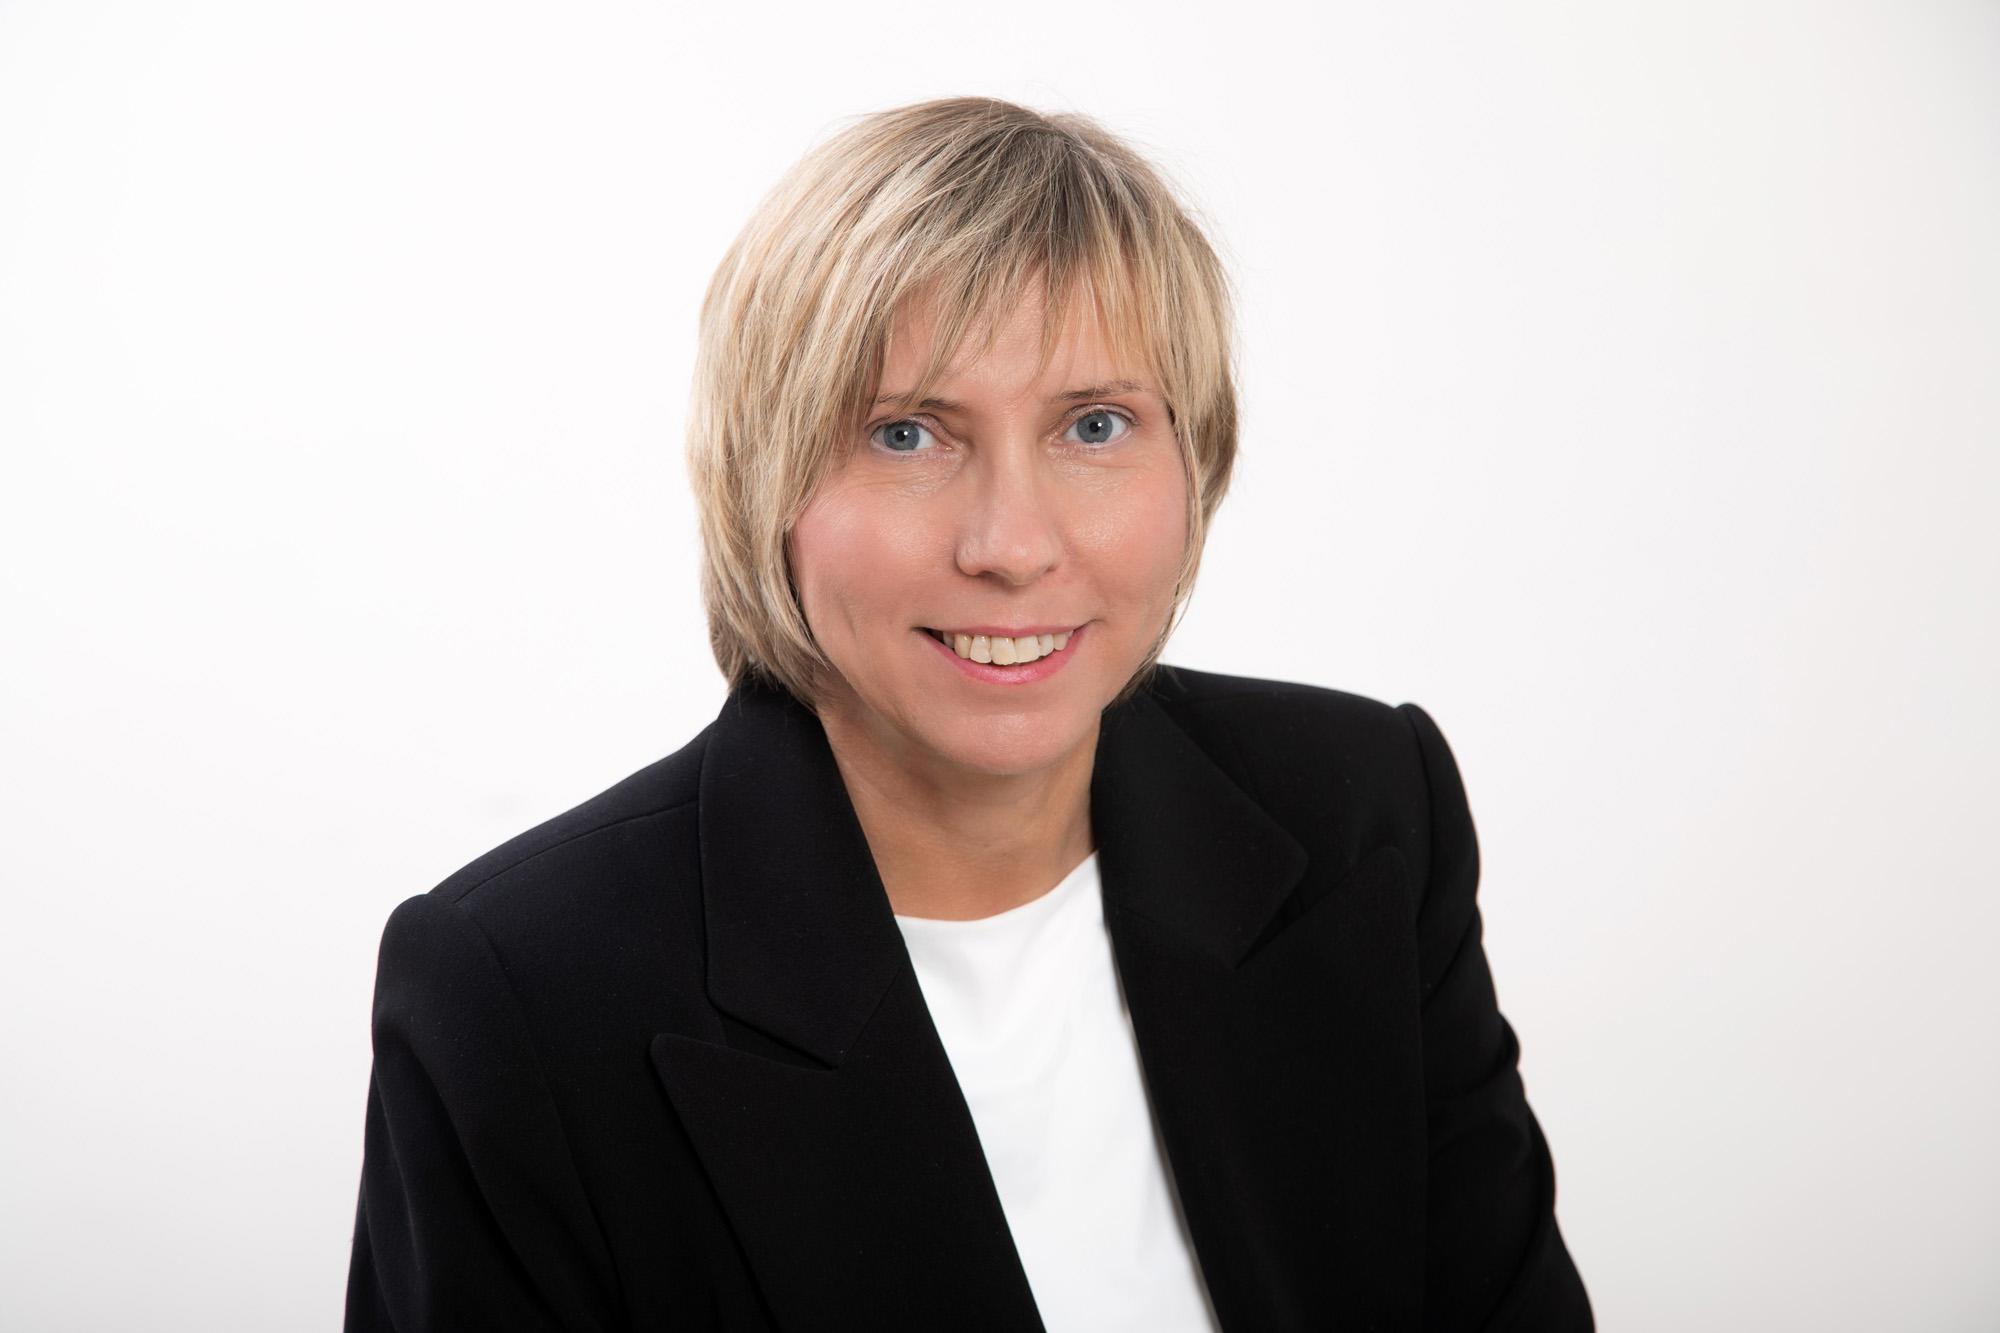 Fotos de Karin Geller geprüfte Immobilienmaklerin / Hausverwalterin IVD Köln